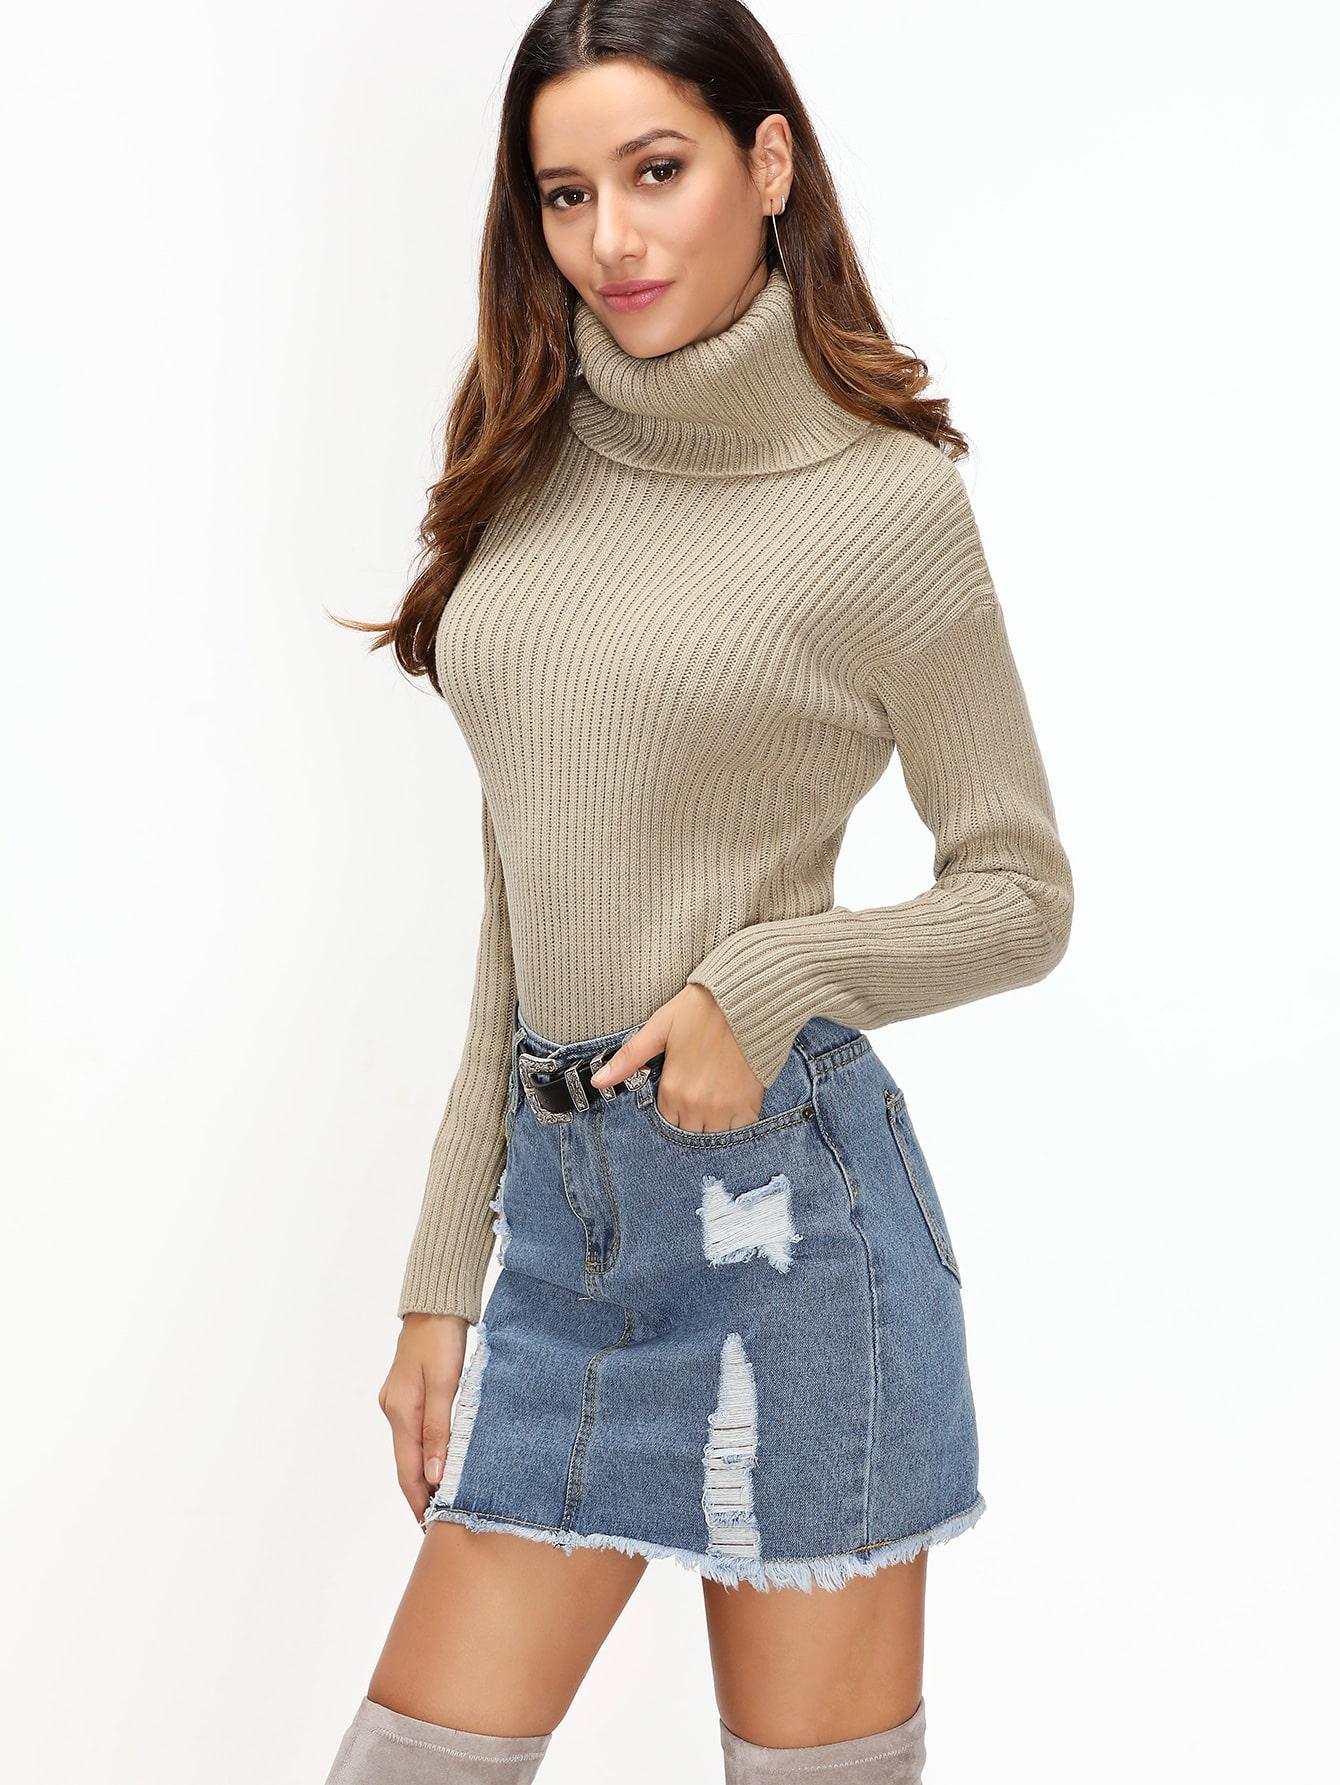 Khaki Turtleneck Drop Shoulder Ribbed Sweater sweater161121104